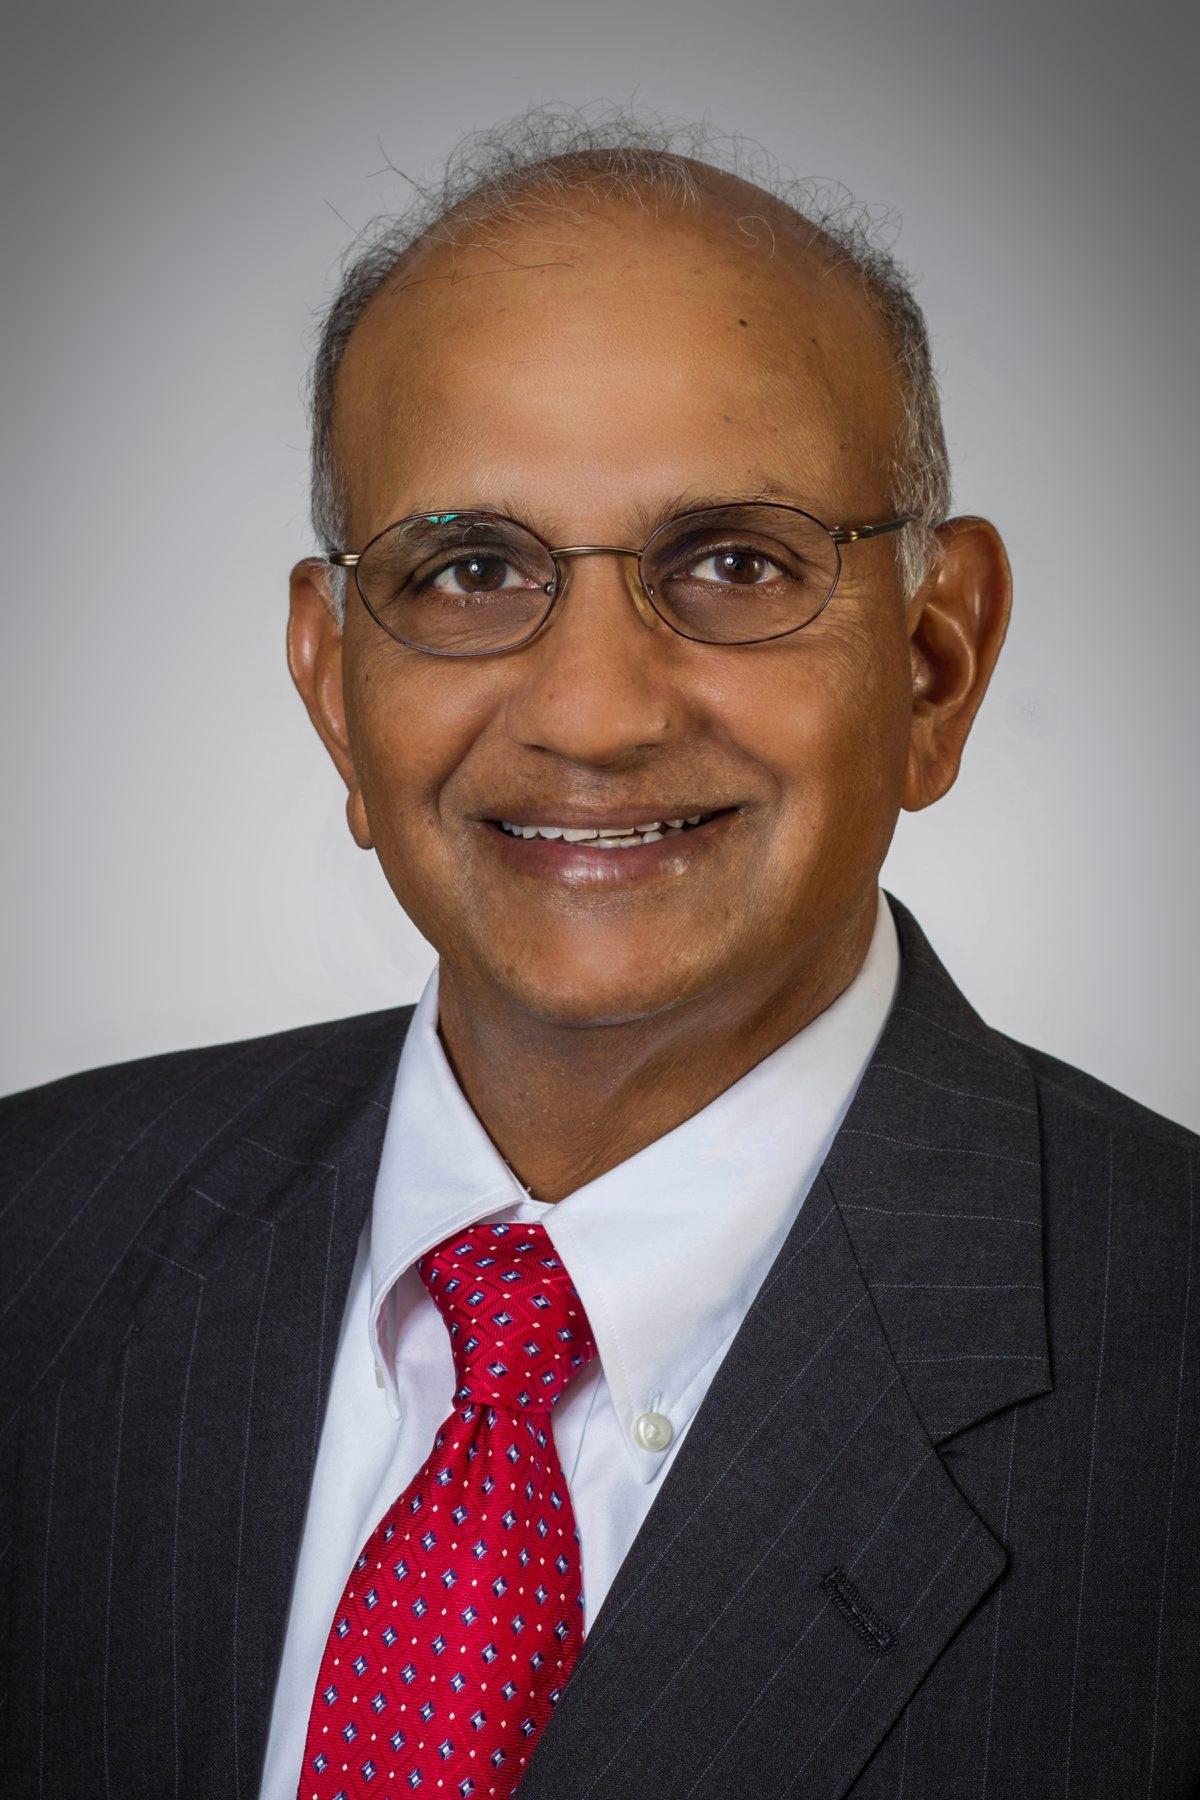 Dr. Kandala K. Chary was named chief medical officer at CCS Oncology.